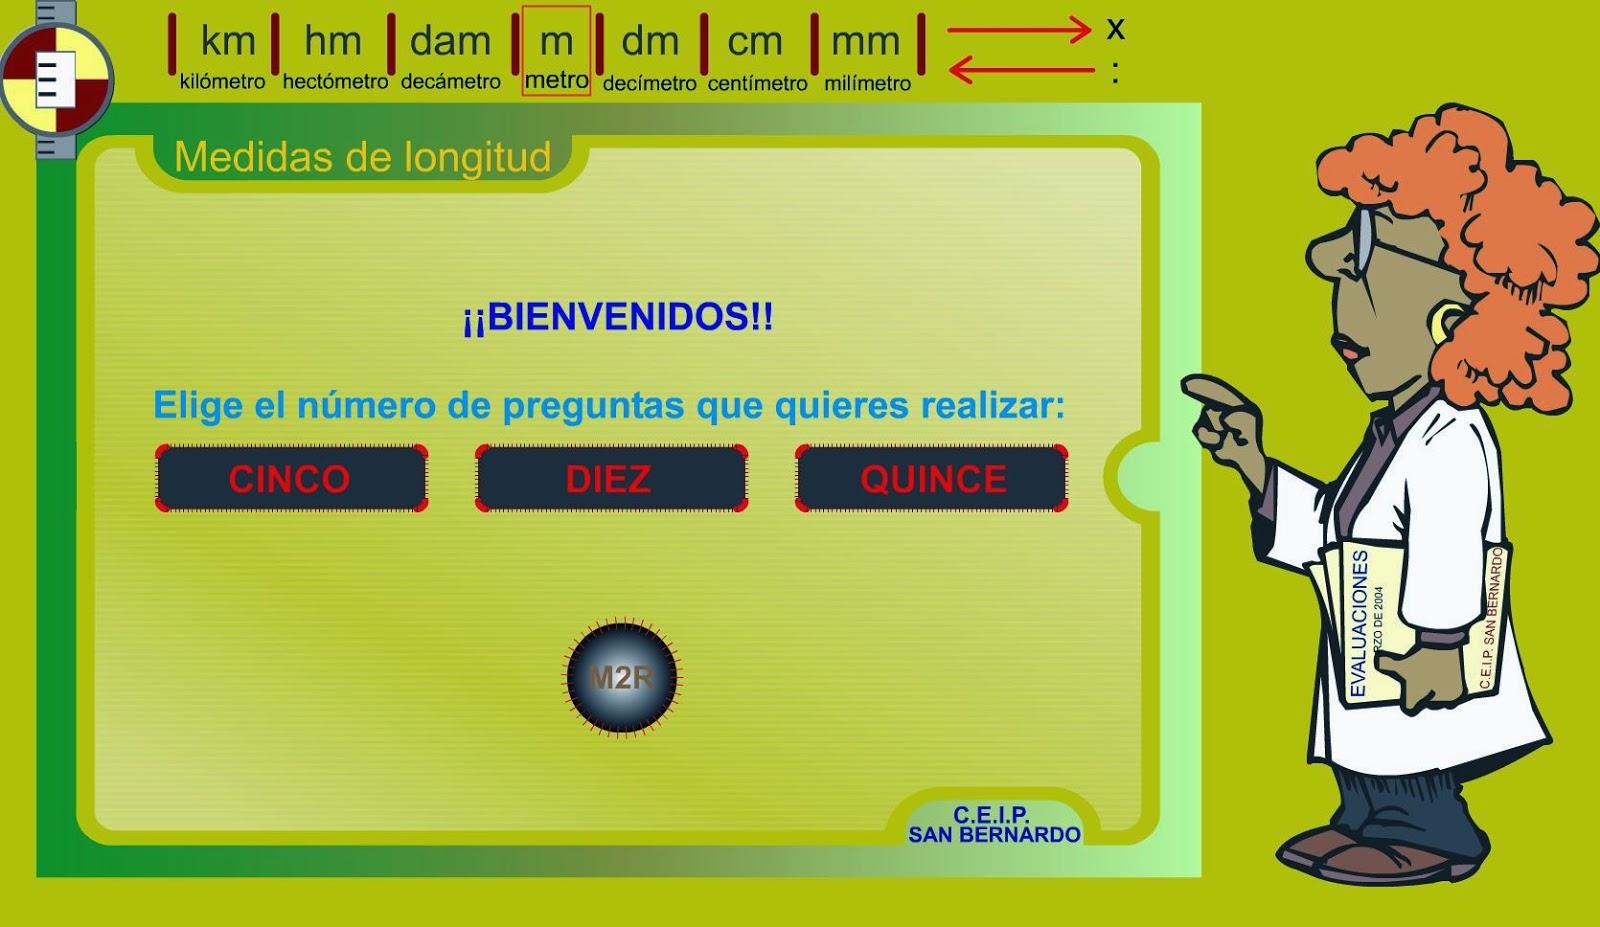 http://www.gobiernodecanarias.org/educacion/3/WebC/eltanque/todo_mate/medidas/longitud/longitud.html